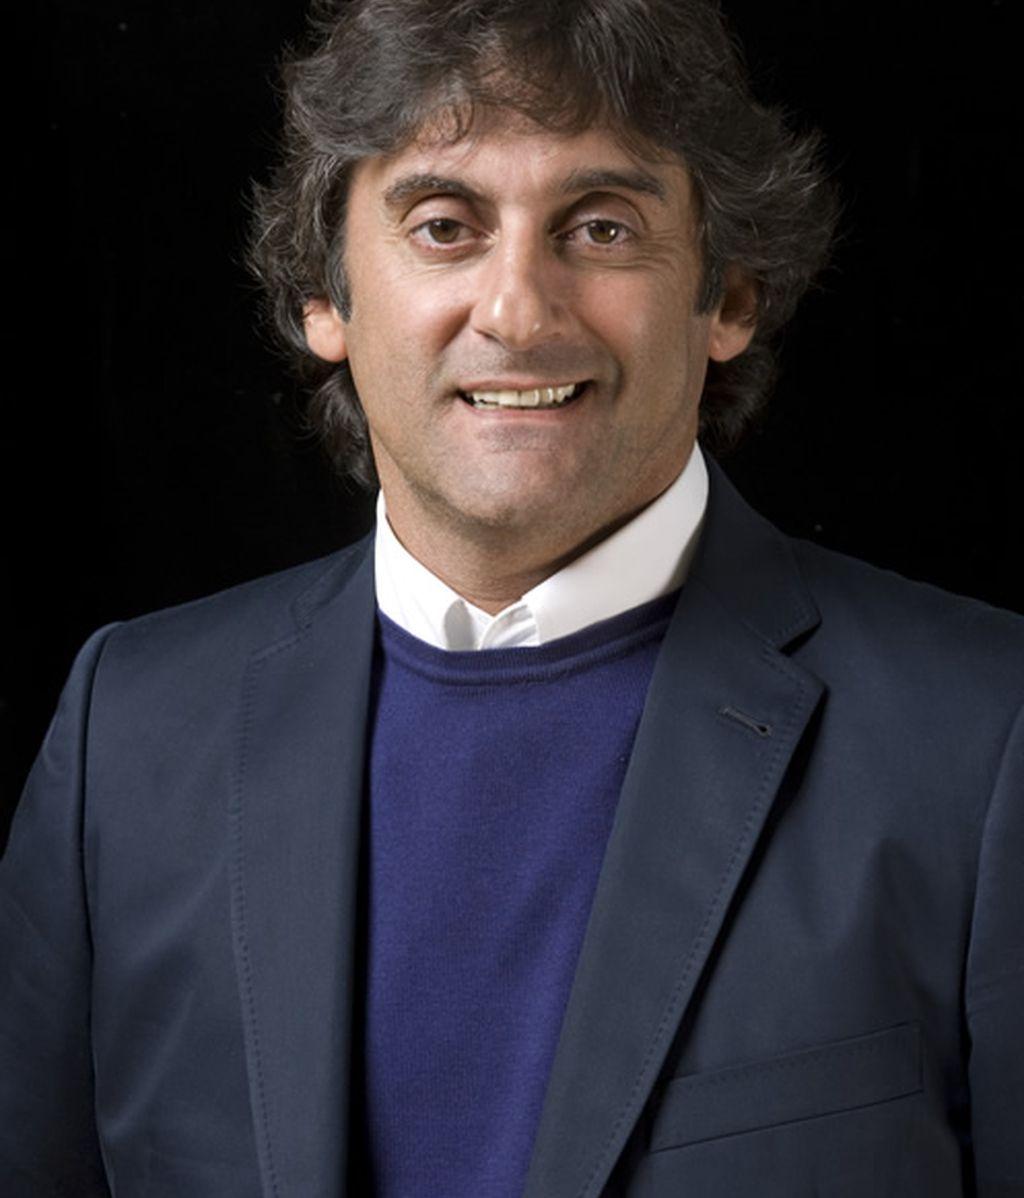 Enzo Francescoli, padrino de Cracks